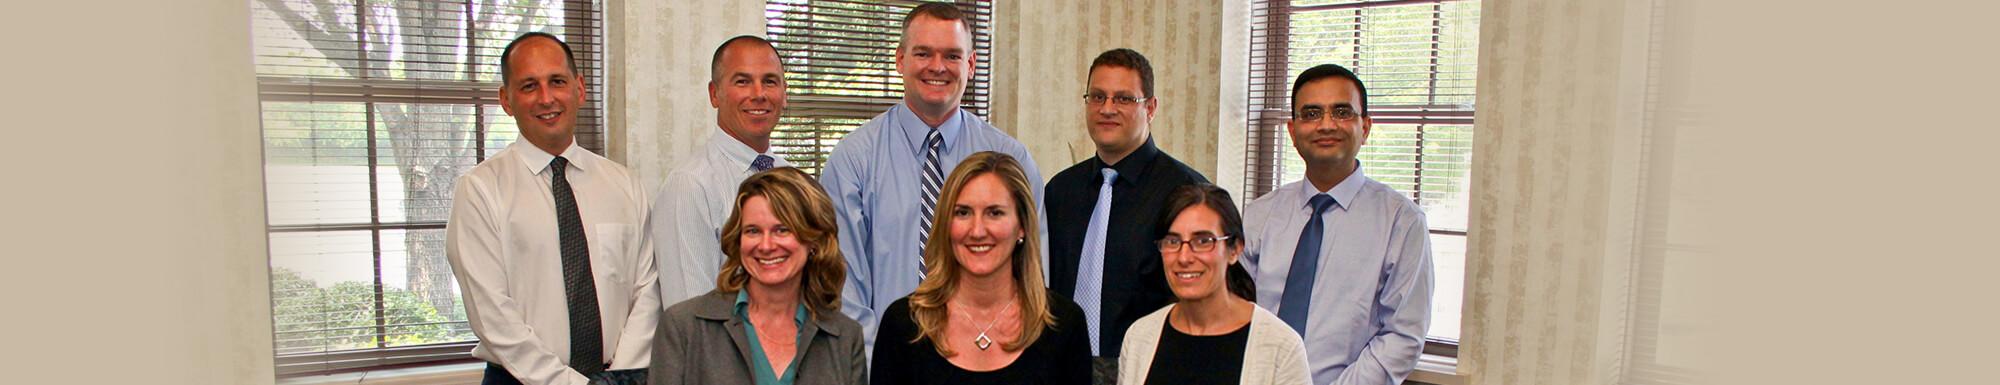 Gastroenterologists - Carlisle Digestive Disease Associates - Carlisle, PA